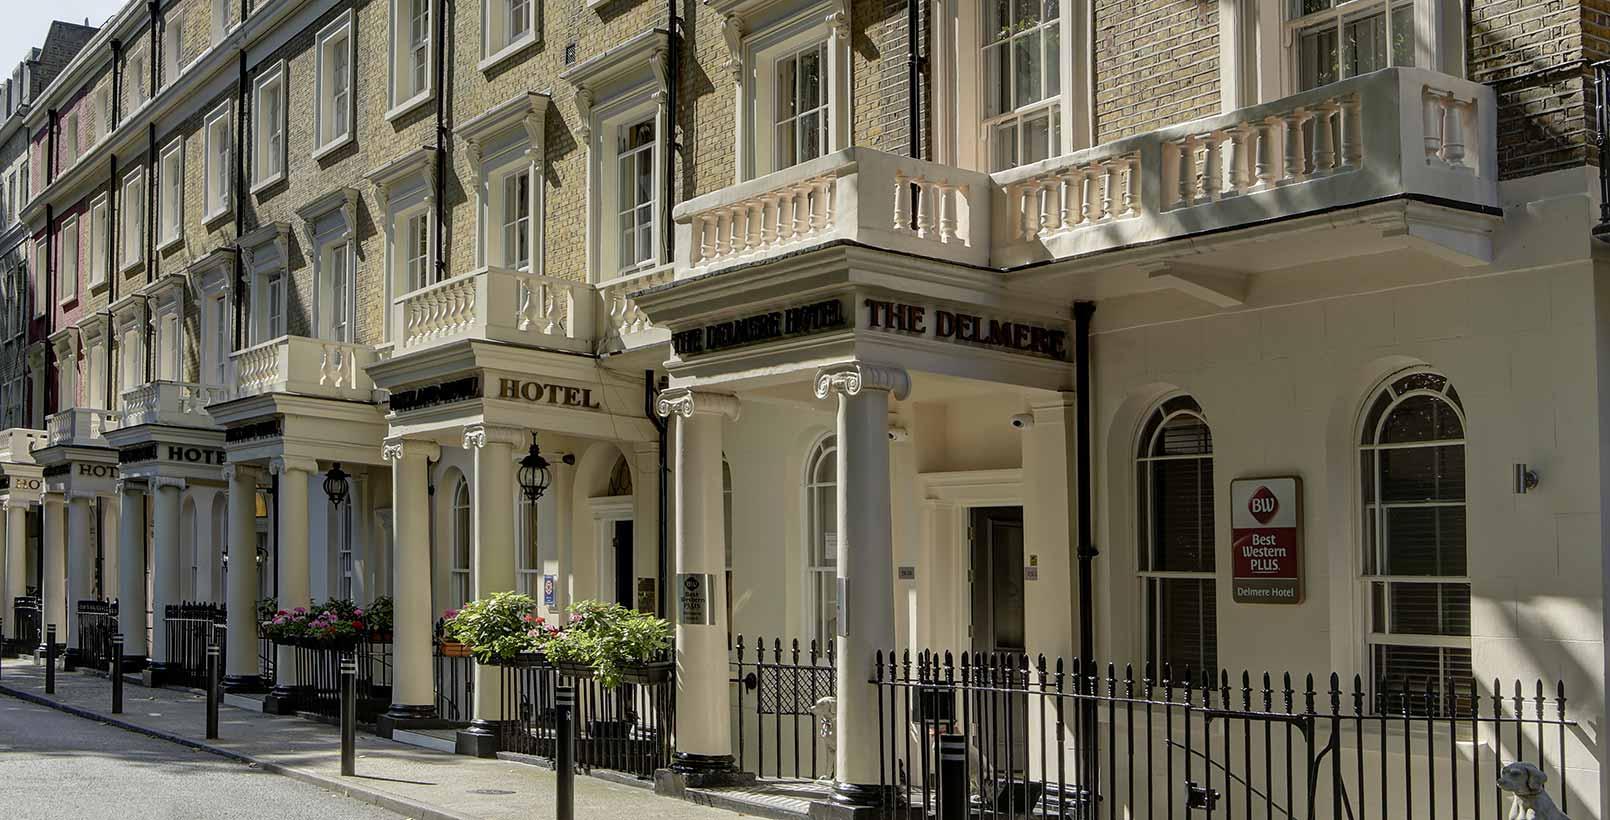 Best Western Plus Delmere Hotel